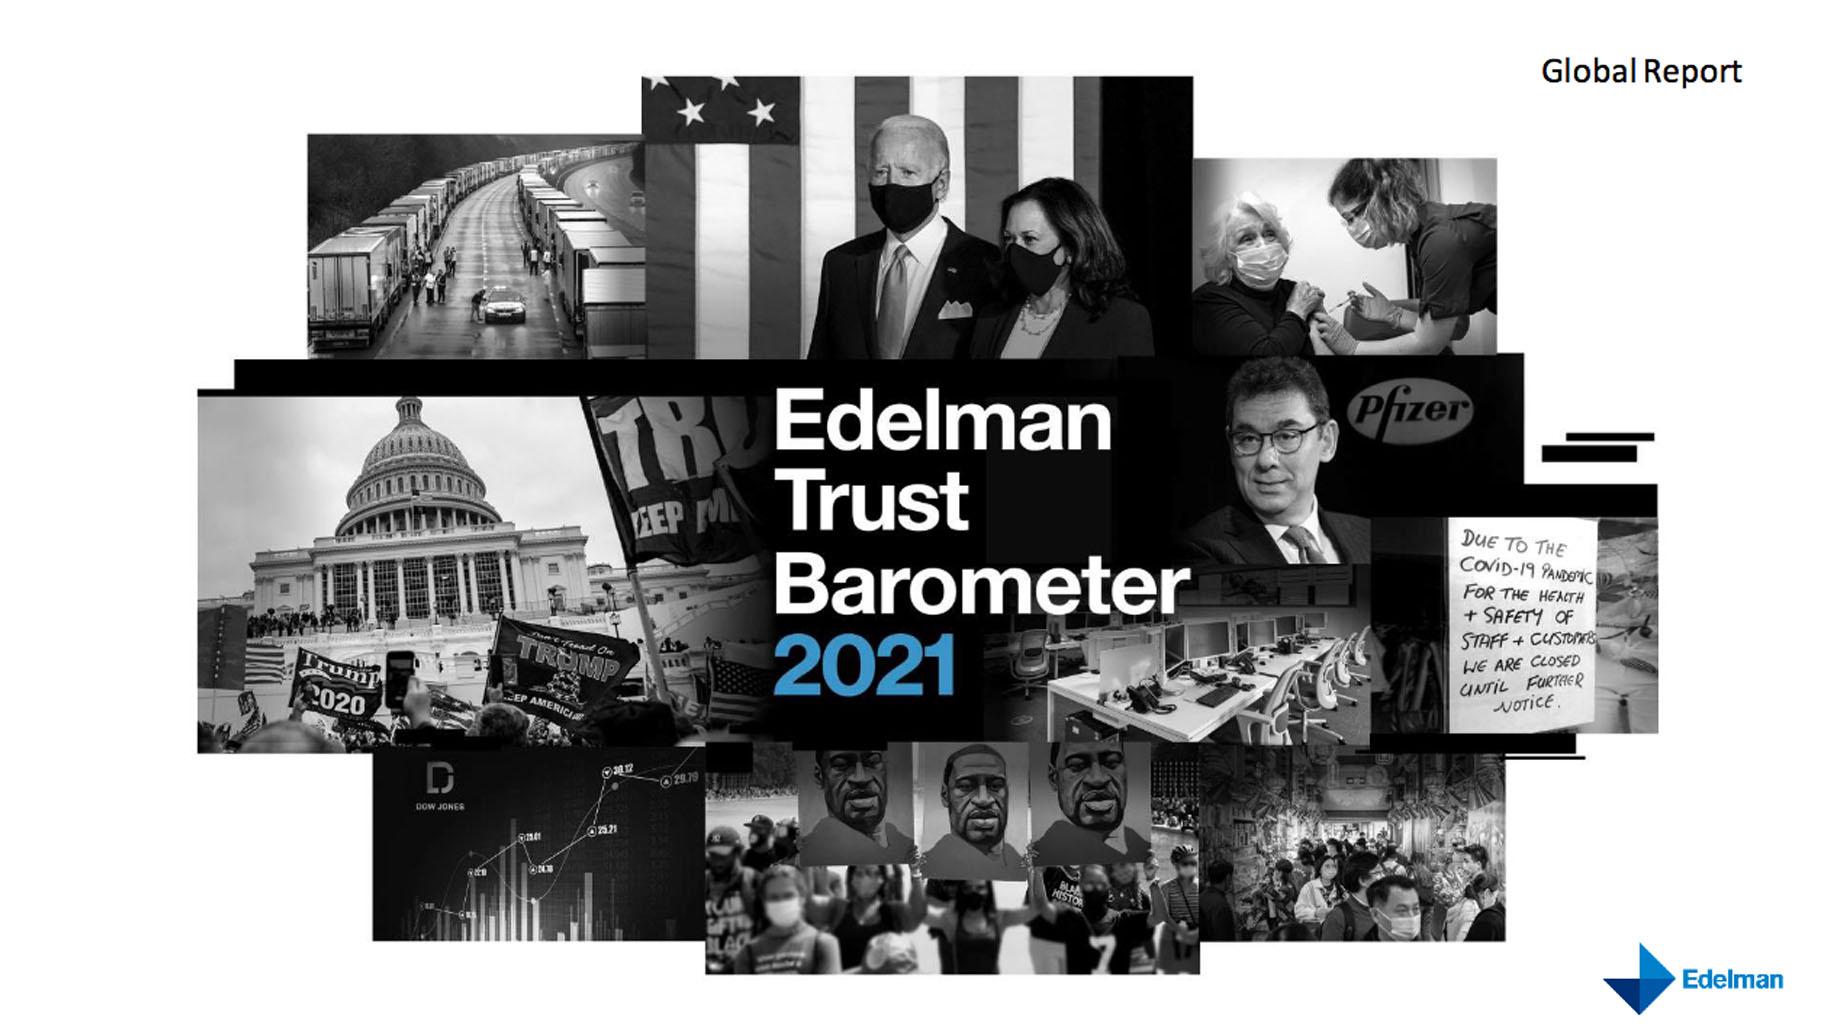 edelmann-trust-2021-2